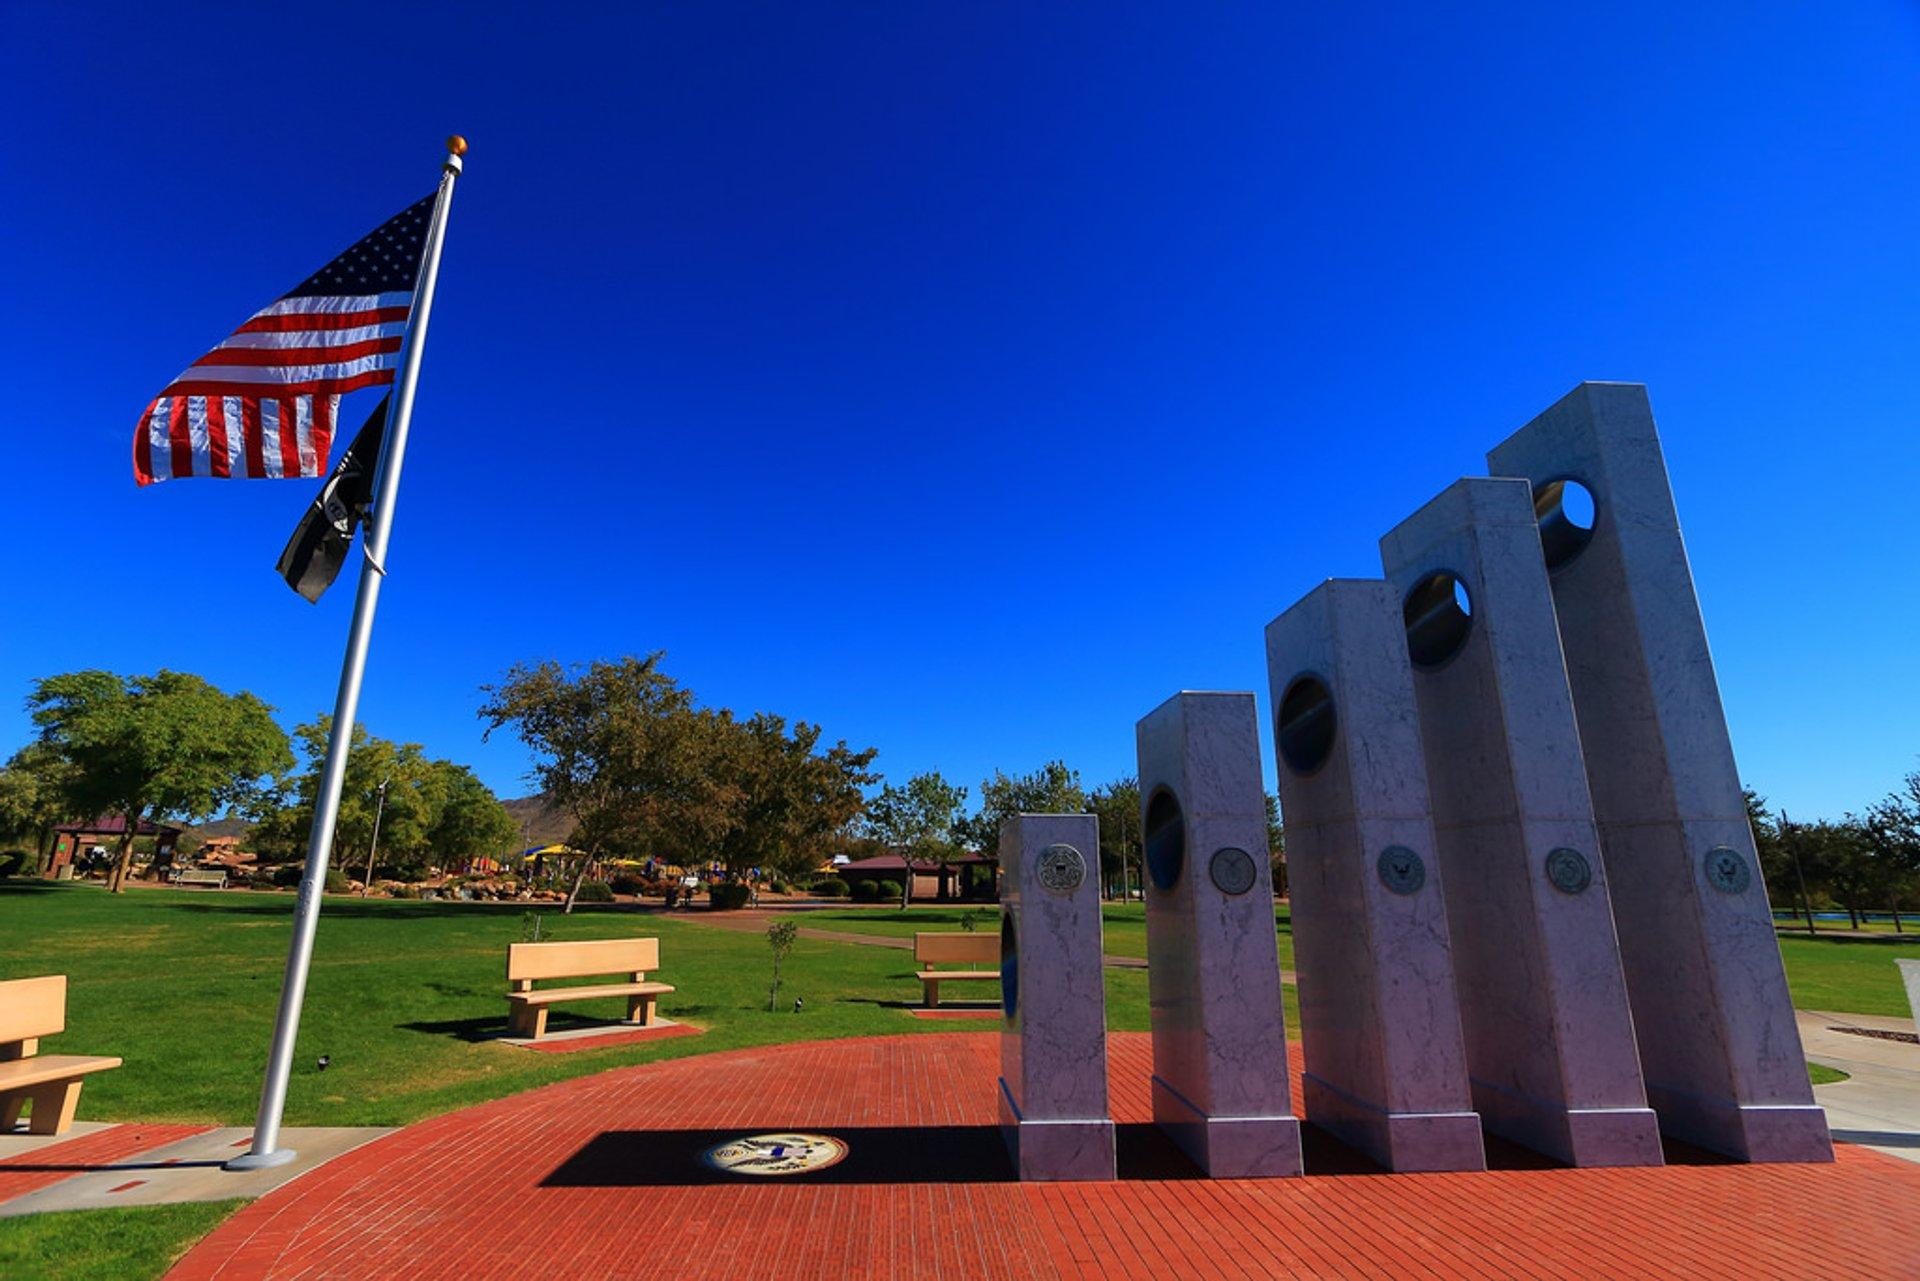 Solar Spotlight at the Anthem Veterans Memorial in Arizona 2019 - Best Time